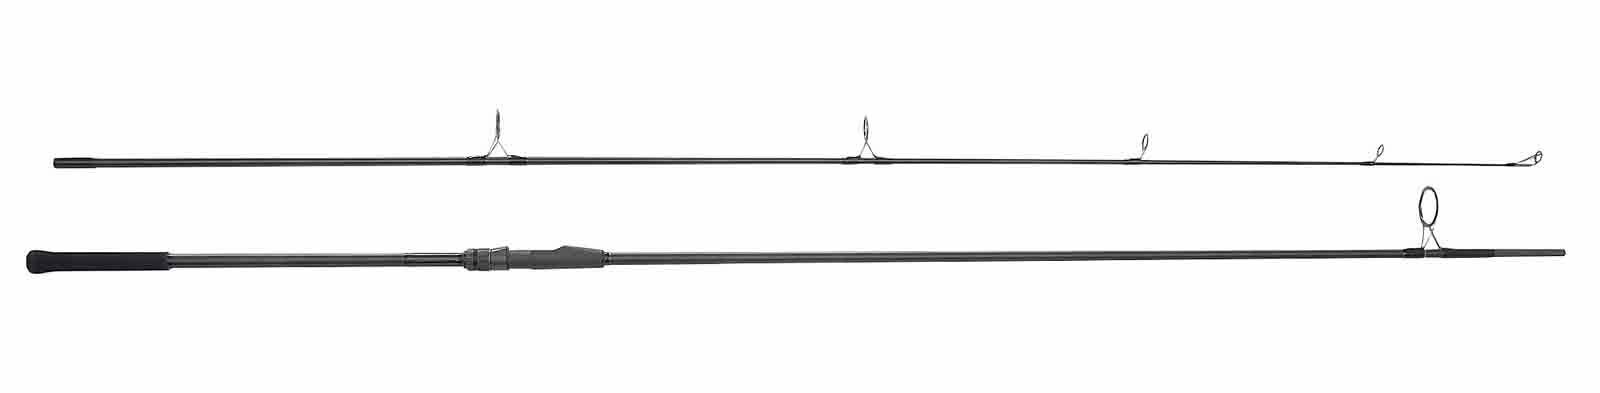 Graus Graus Graus GT 13ft Extreme XSM Spod Marker Casting Spod / Floats Carp Fishing Rod 11d661